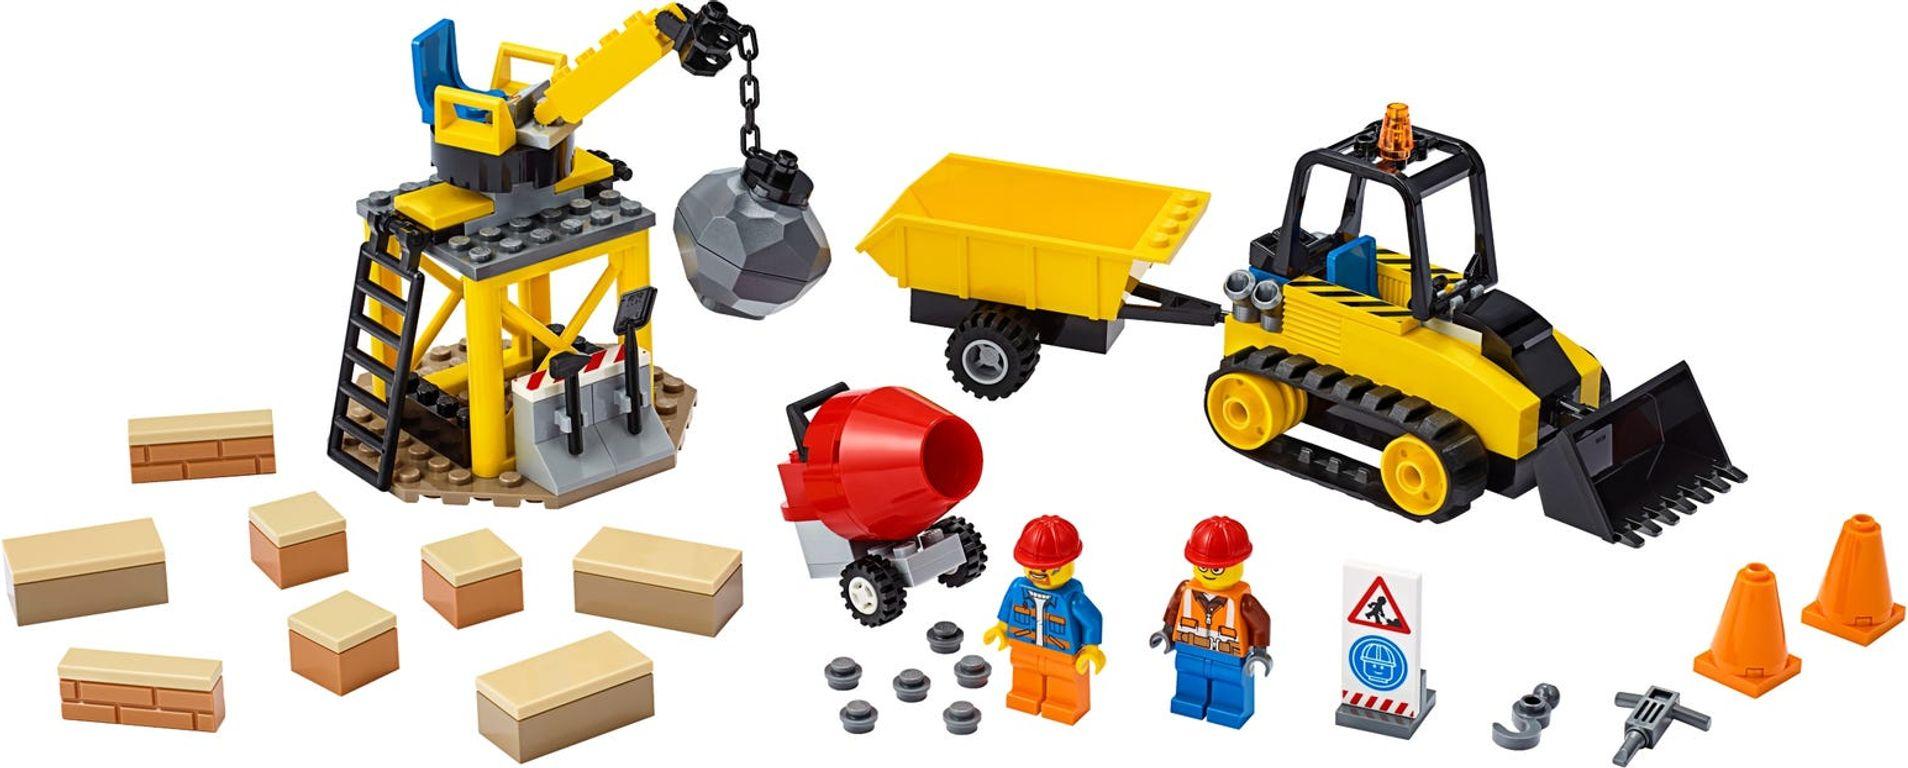 Construction Bulldozer components